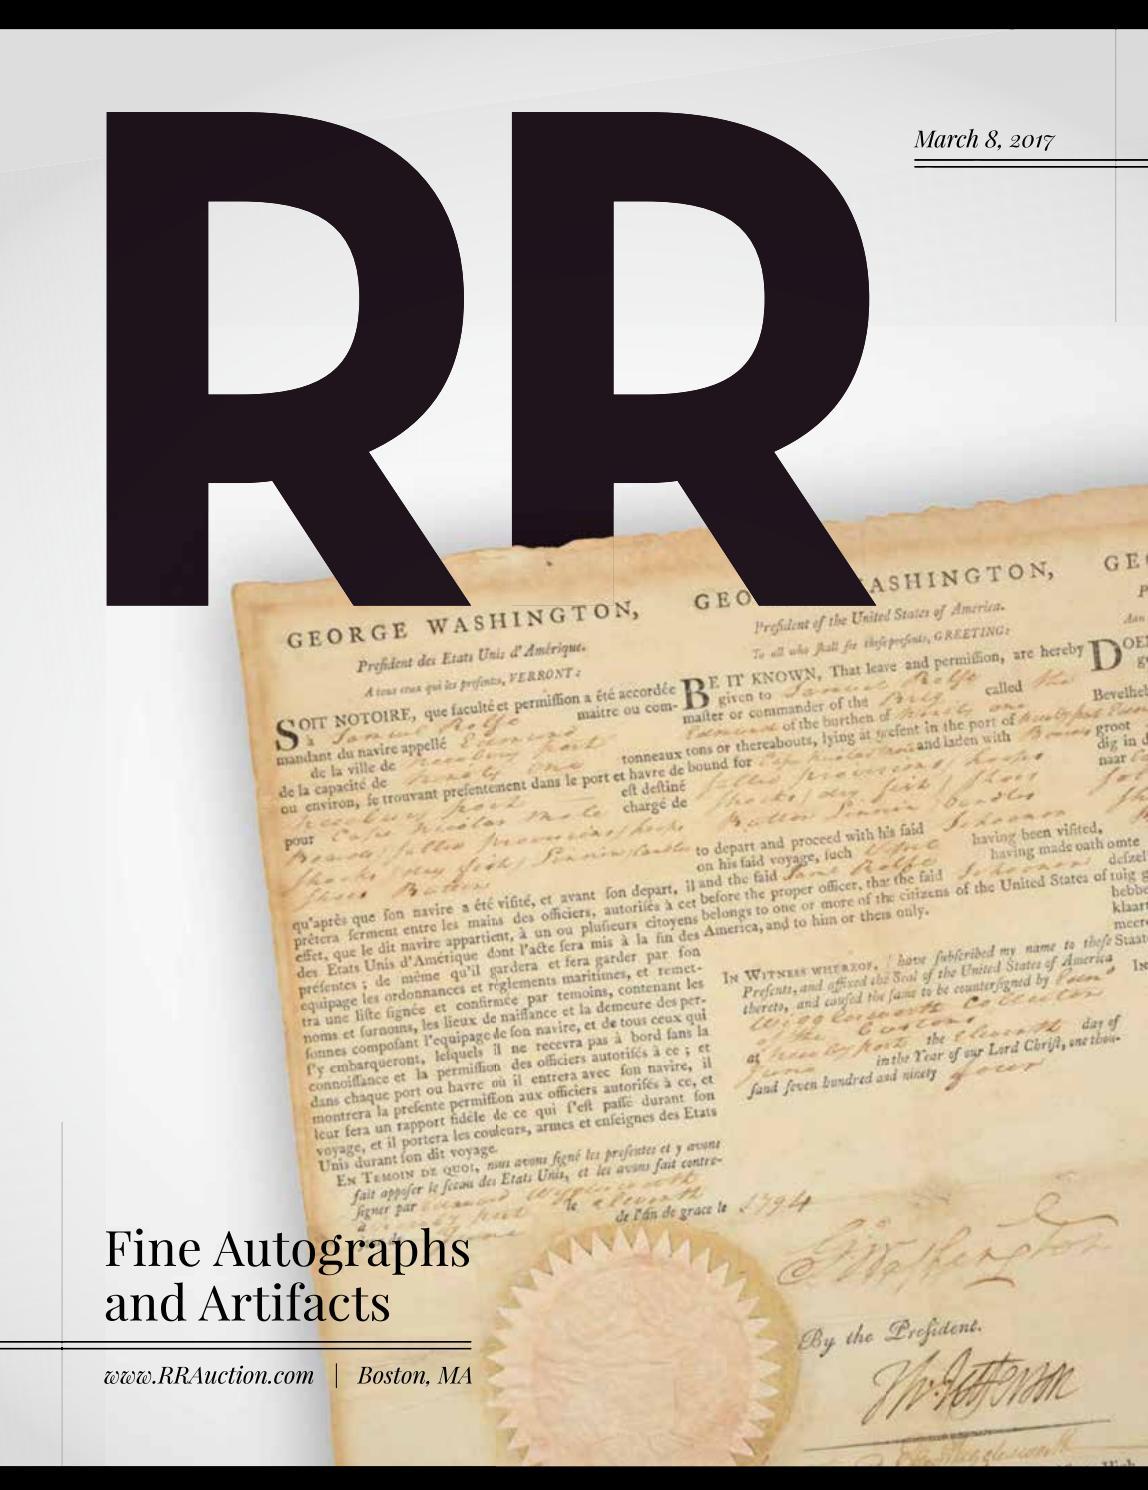 Rr Autograph Auctions Consignment Agreement: RR Auction: March 2017 Fine Autograph And Artifact Auction